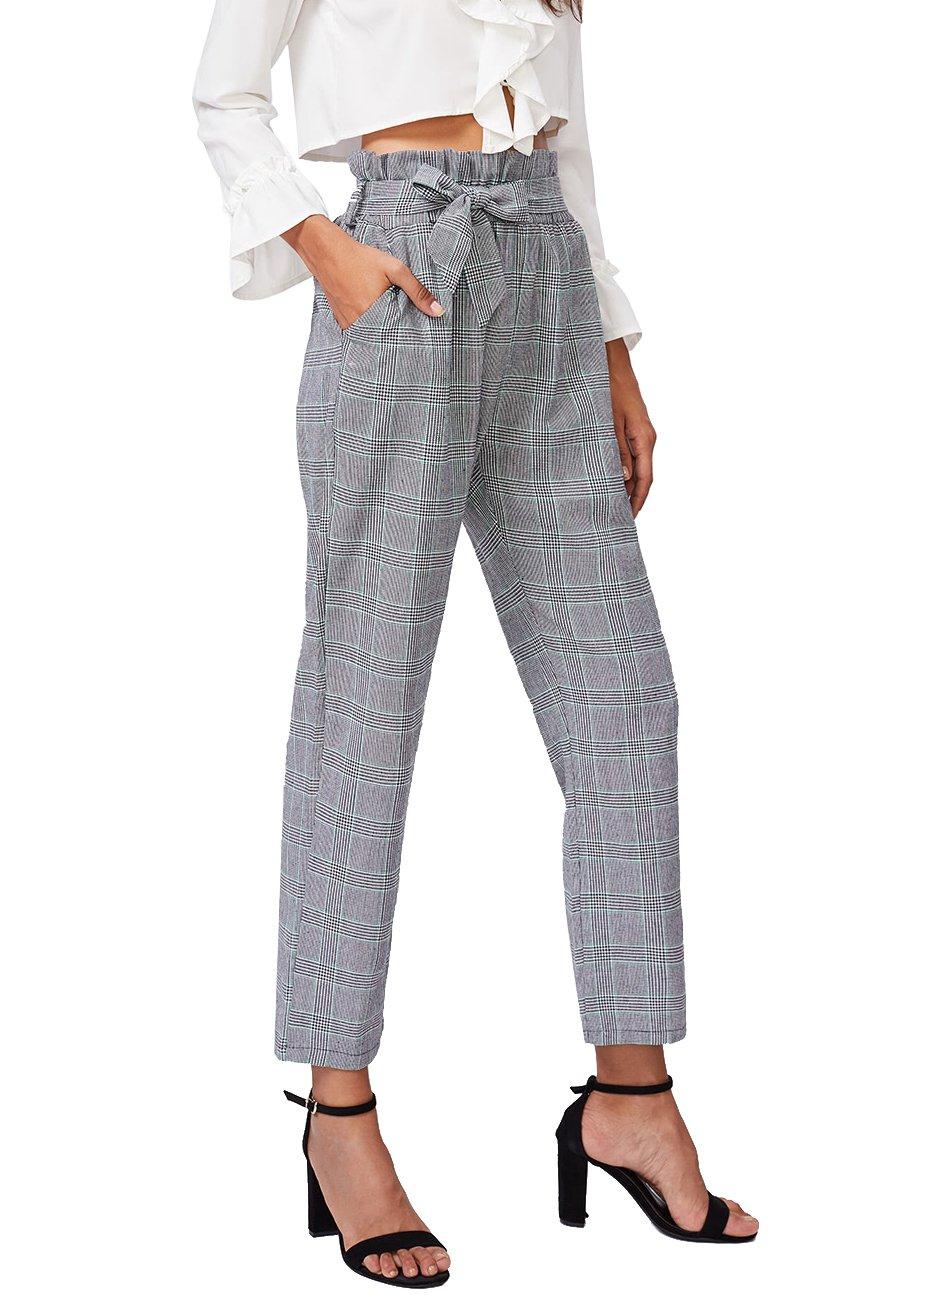 SheIn Women's Ruffle Tie Waist Pants with Pockets X-Large Plaid Grey